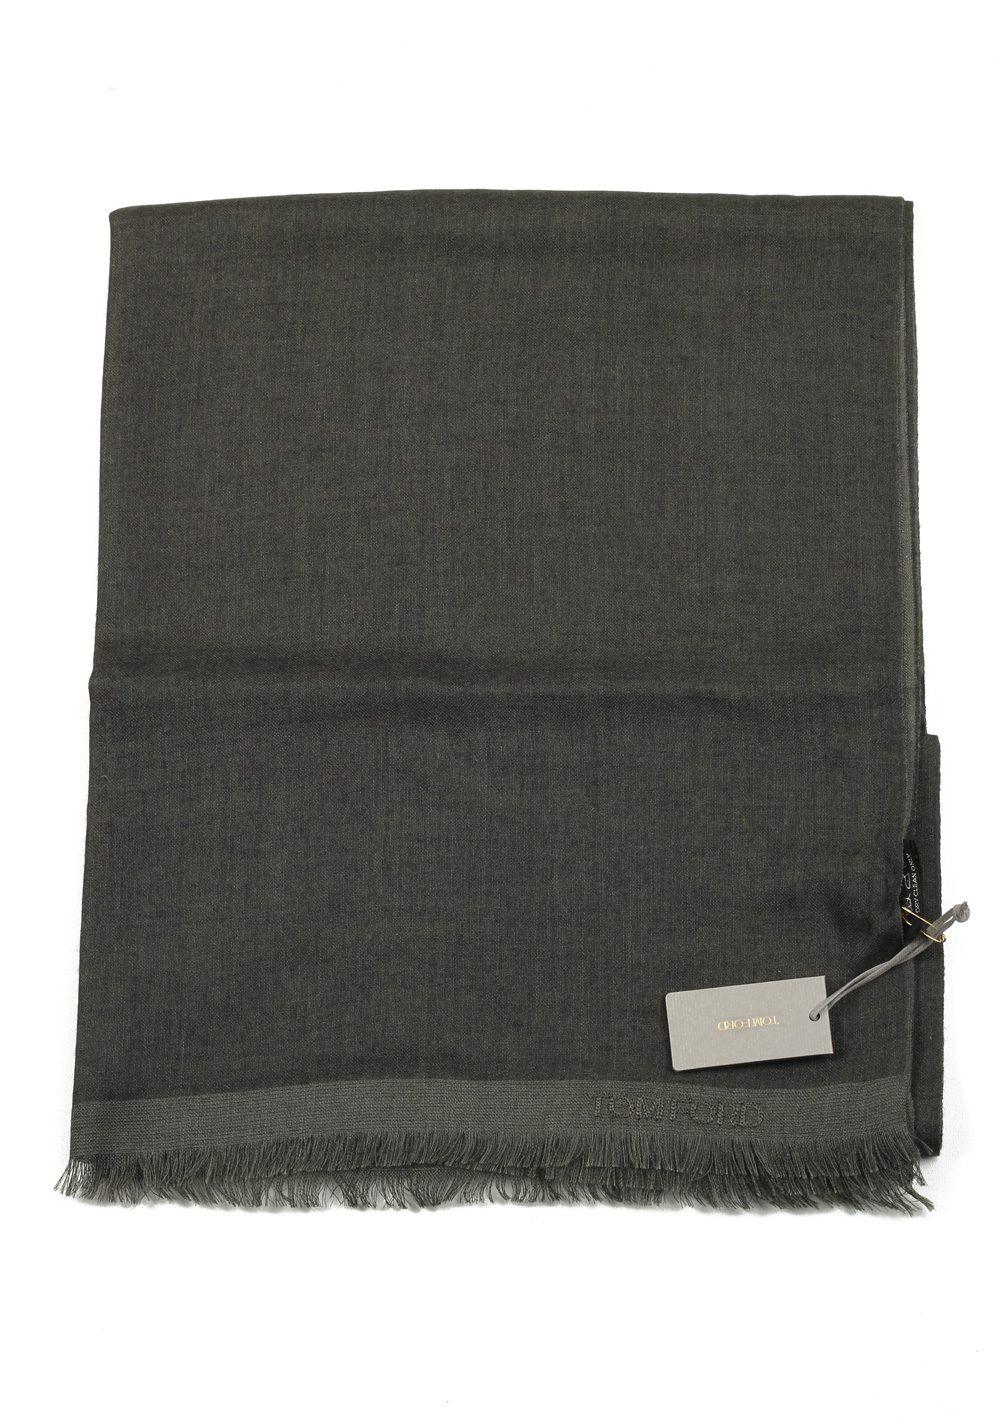 Tom Ford Gray Cashmere Silk Signature Scarf 75″ / 24″ | Costume Limité